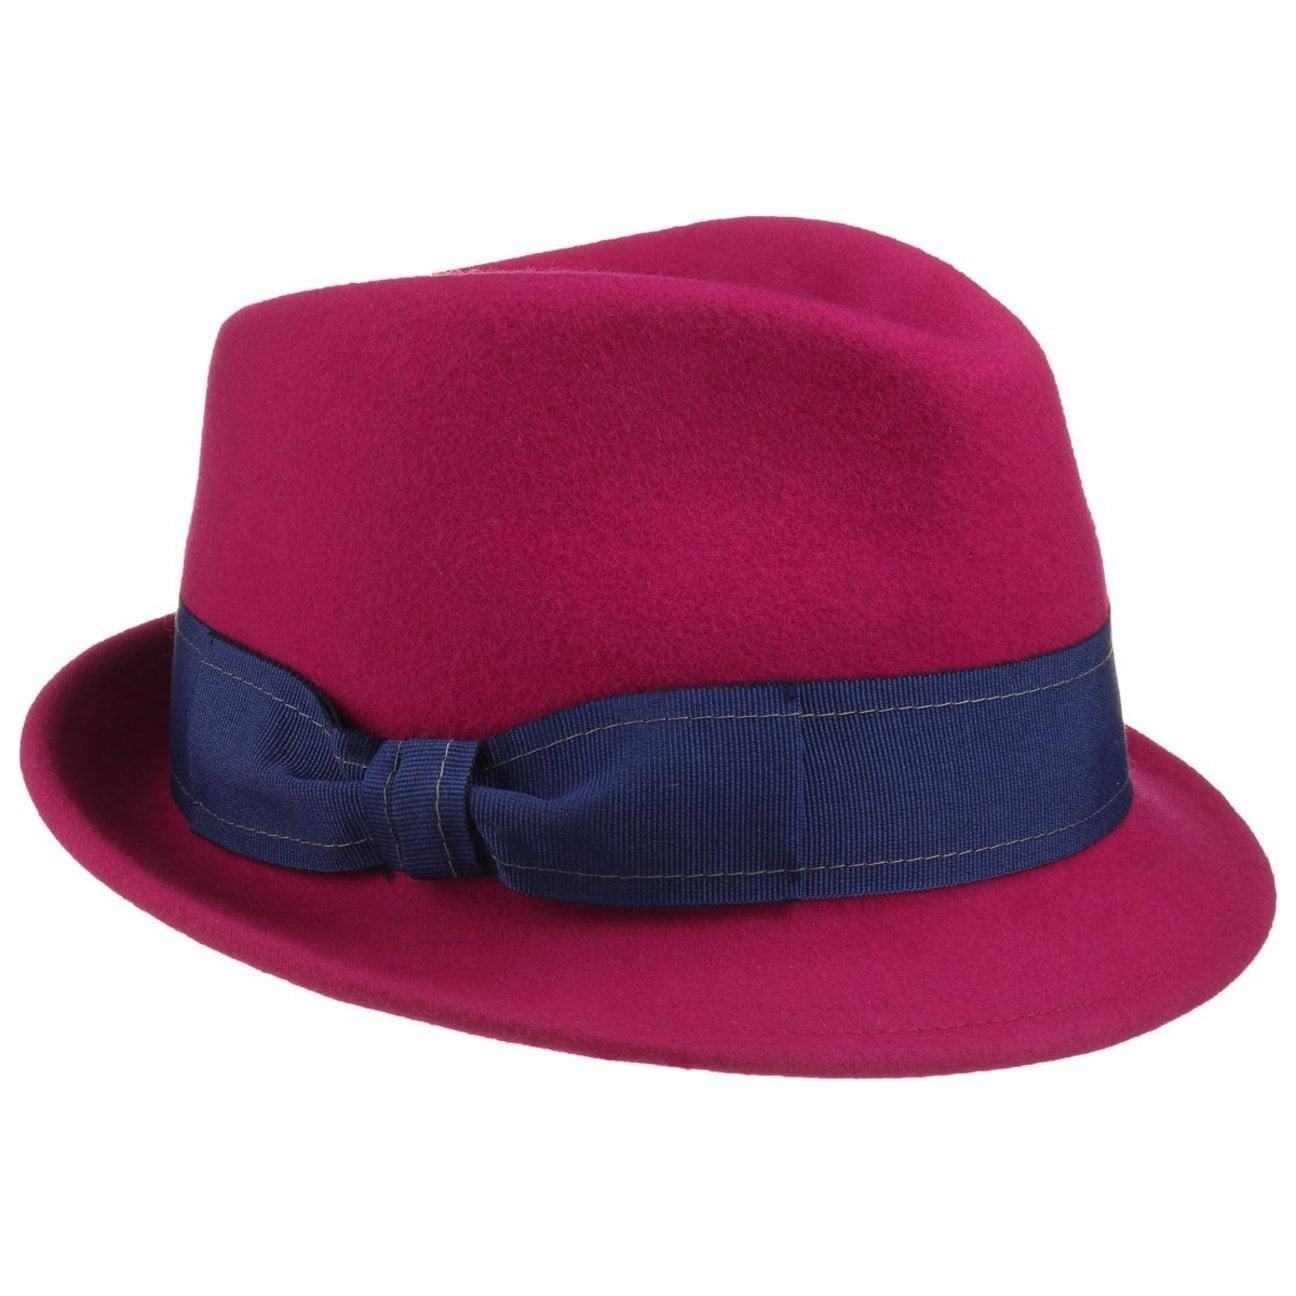 Sombrero Trilby de Mujer Maike by Bront?  sombrero de lana